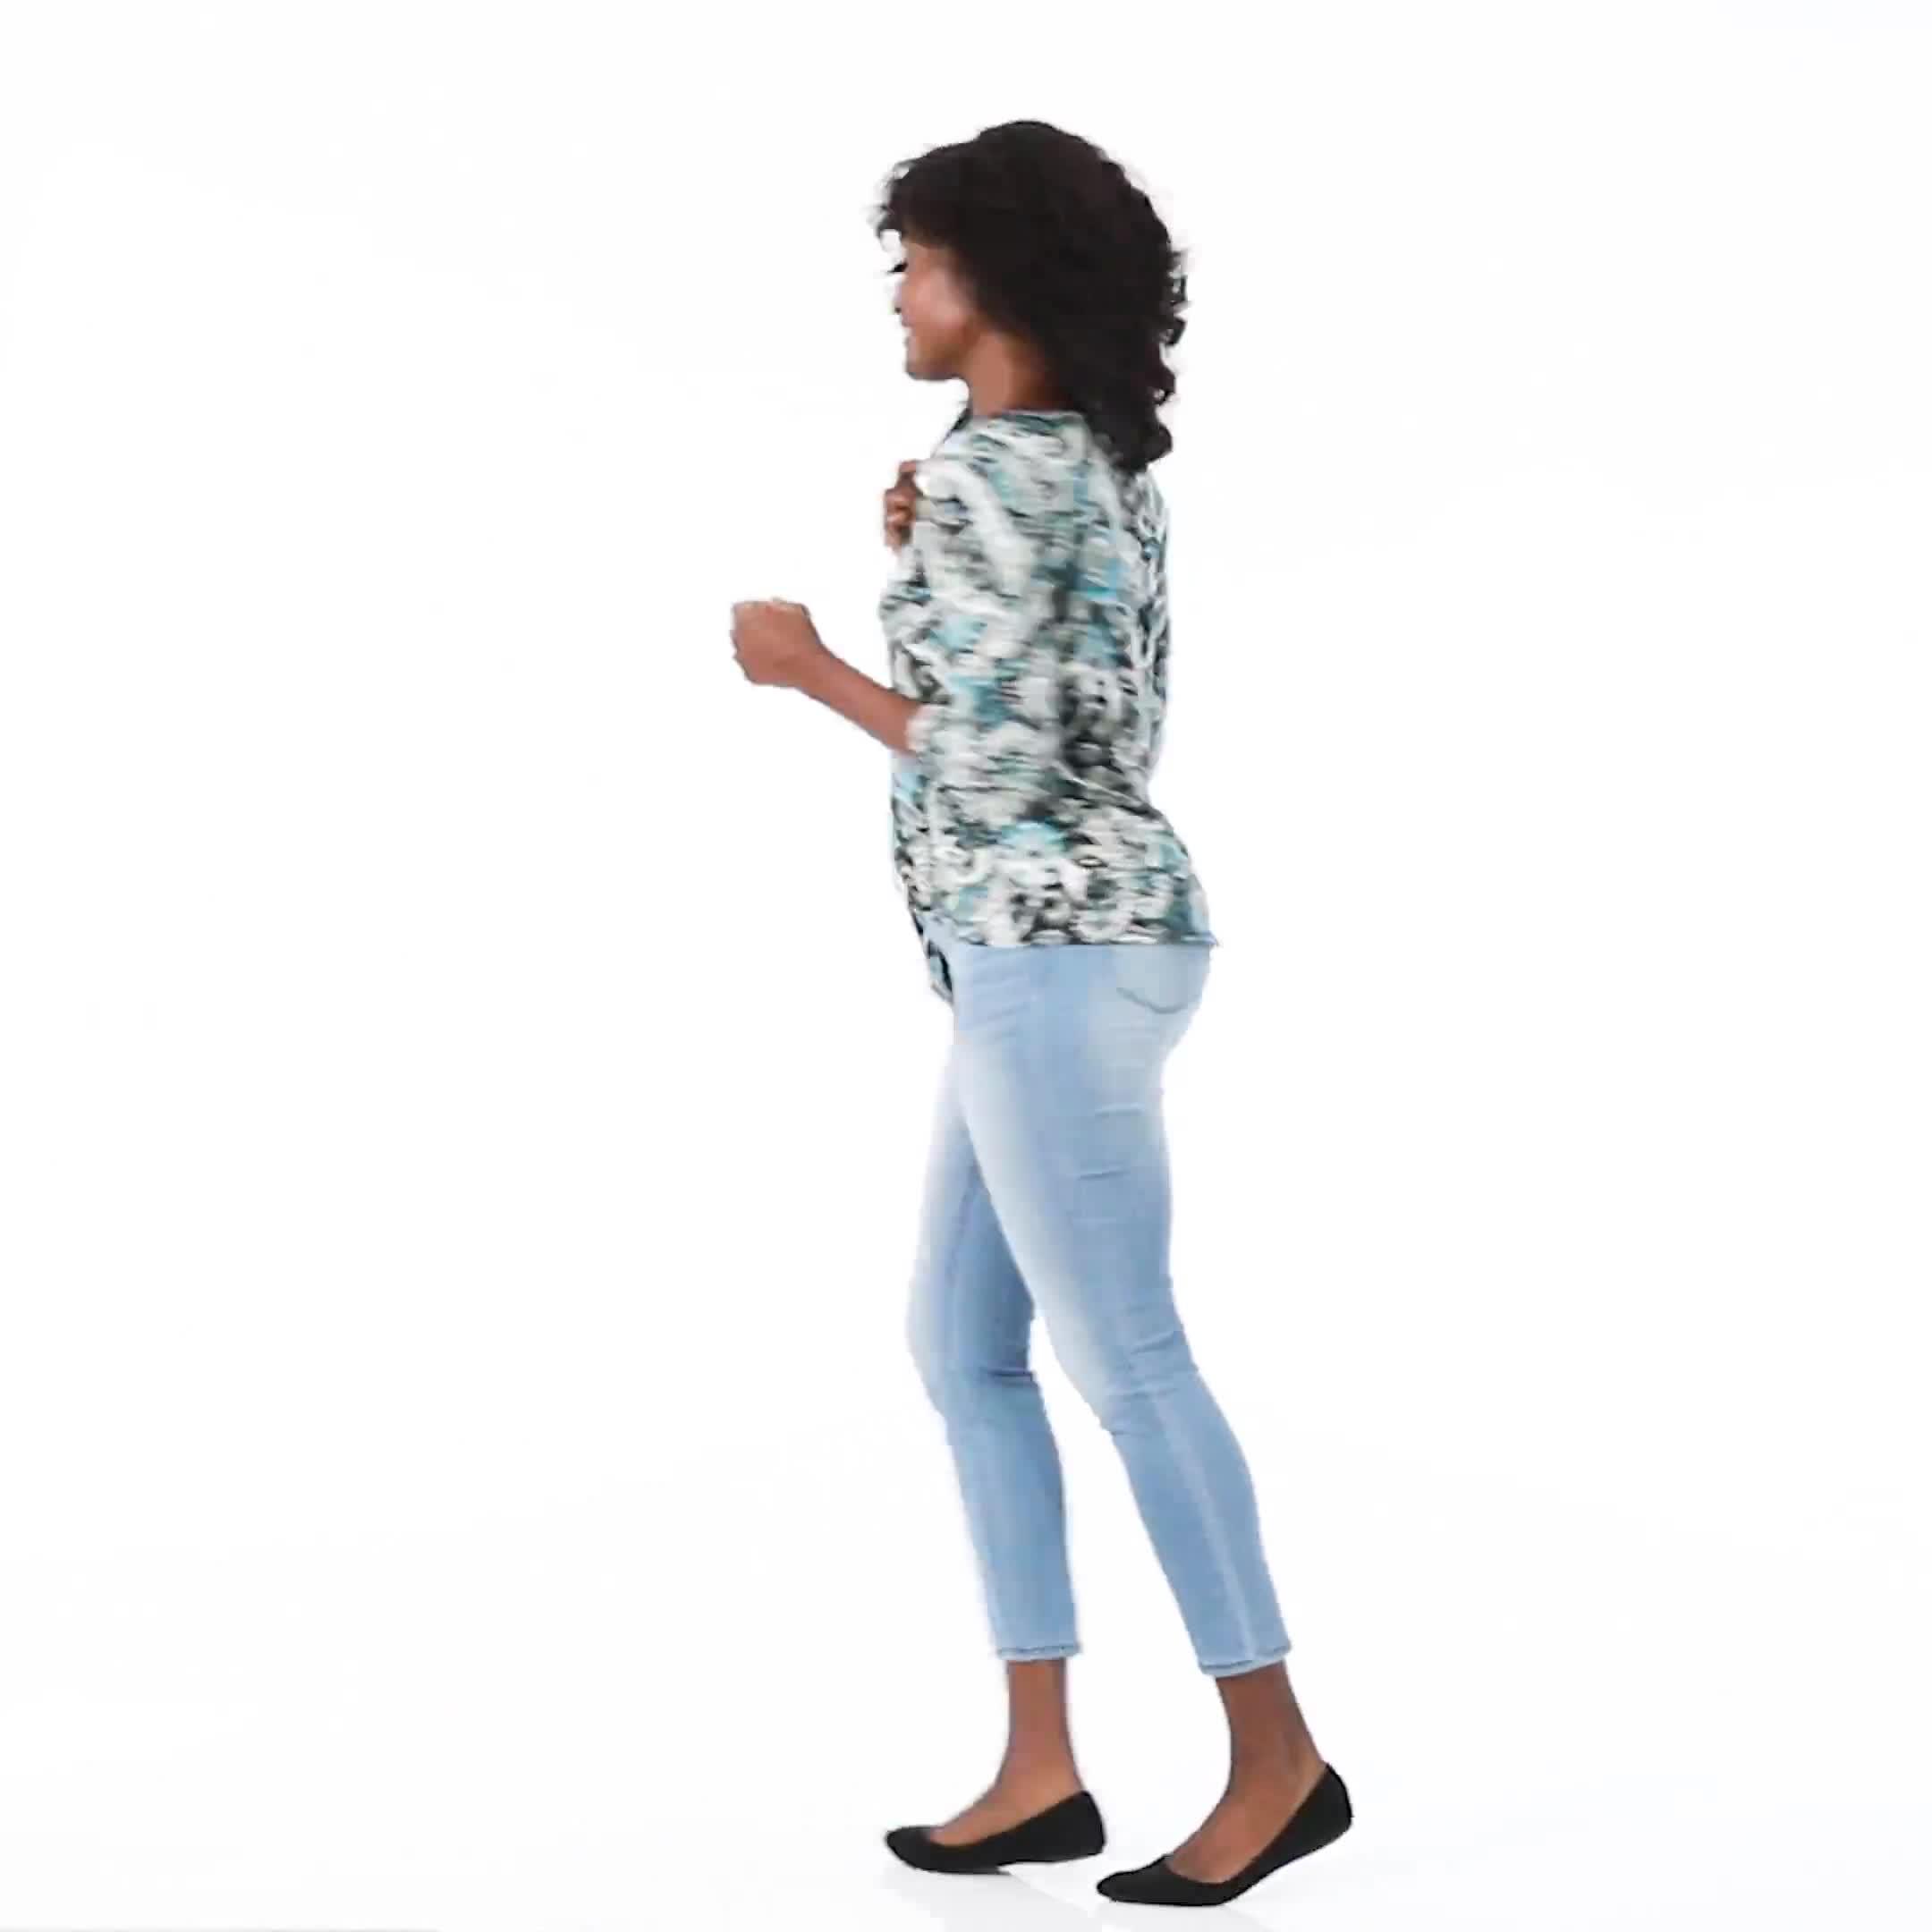 Westport Bohemian Print  Knit Top - Video